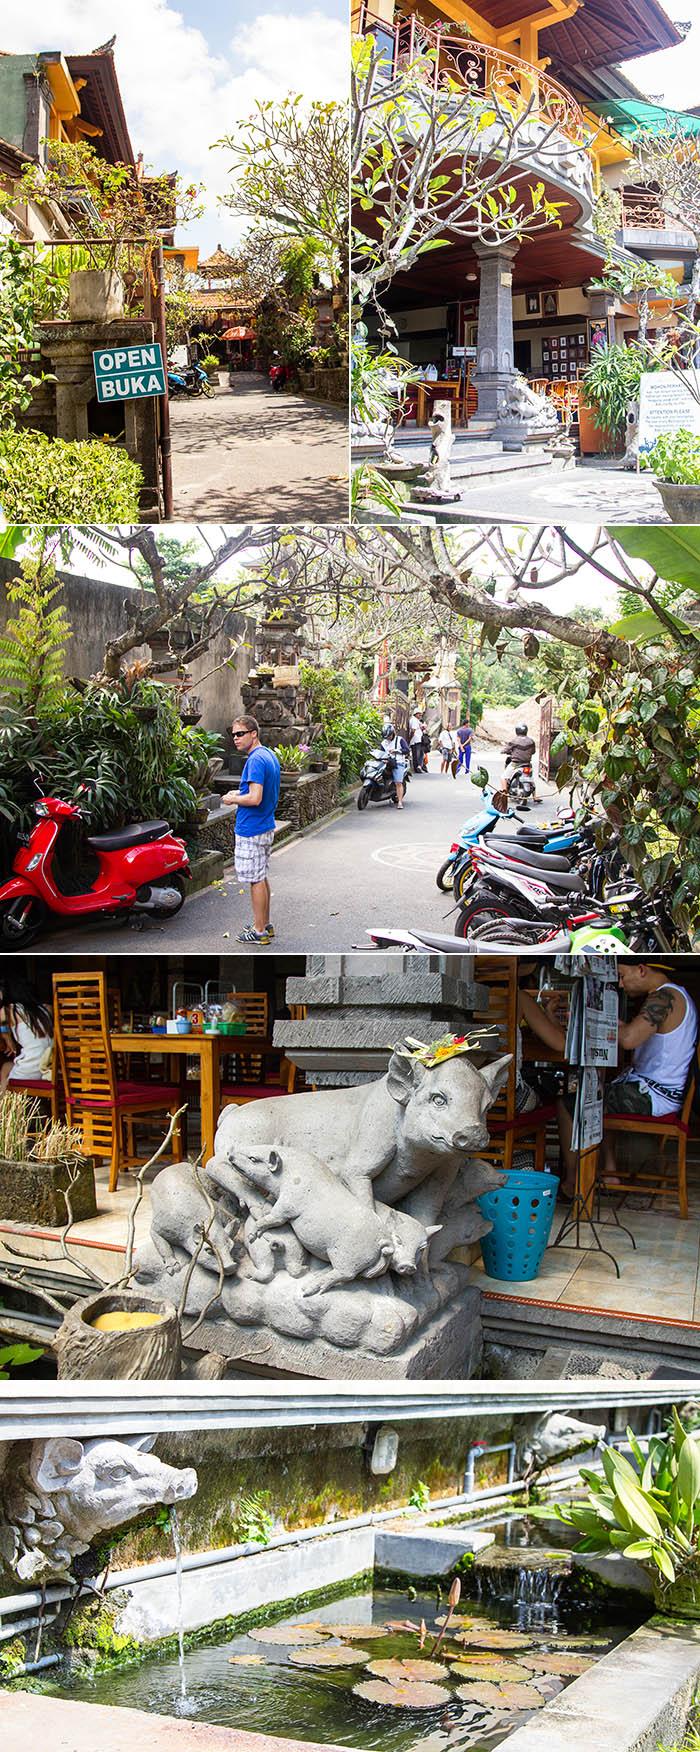 Ibu Oka in Ubud, Bali, Indonesia